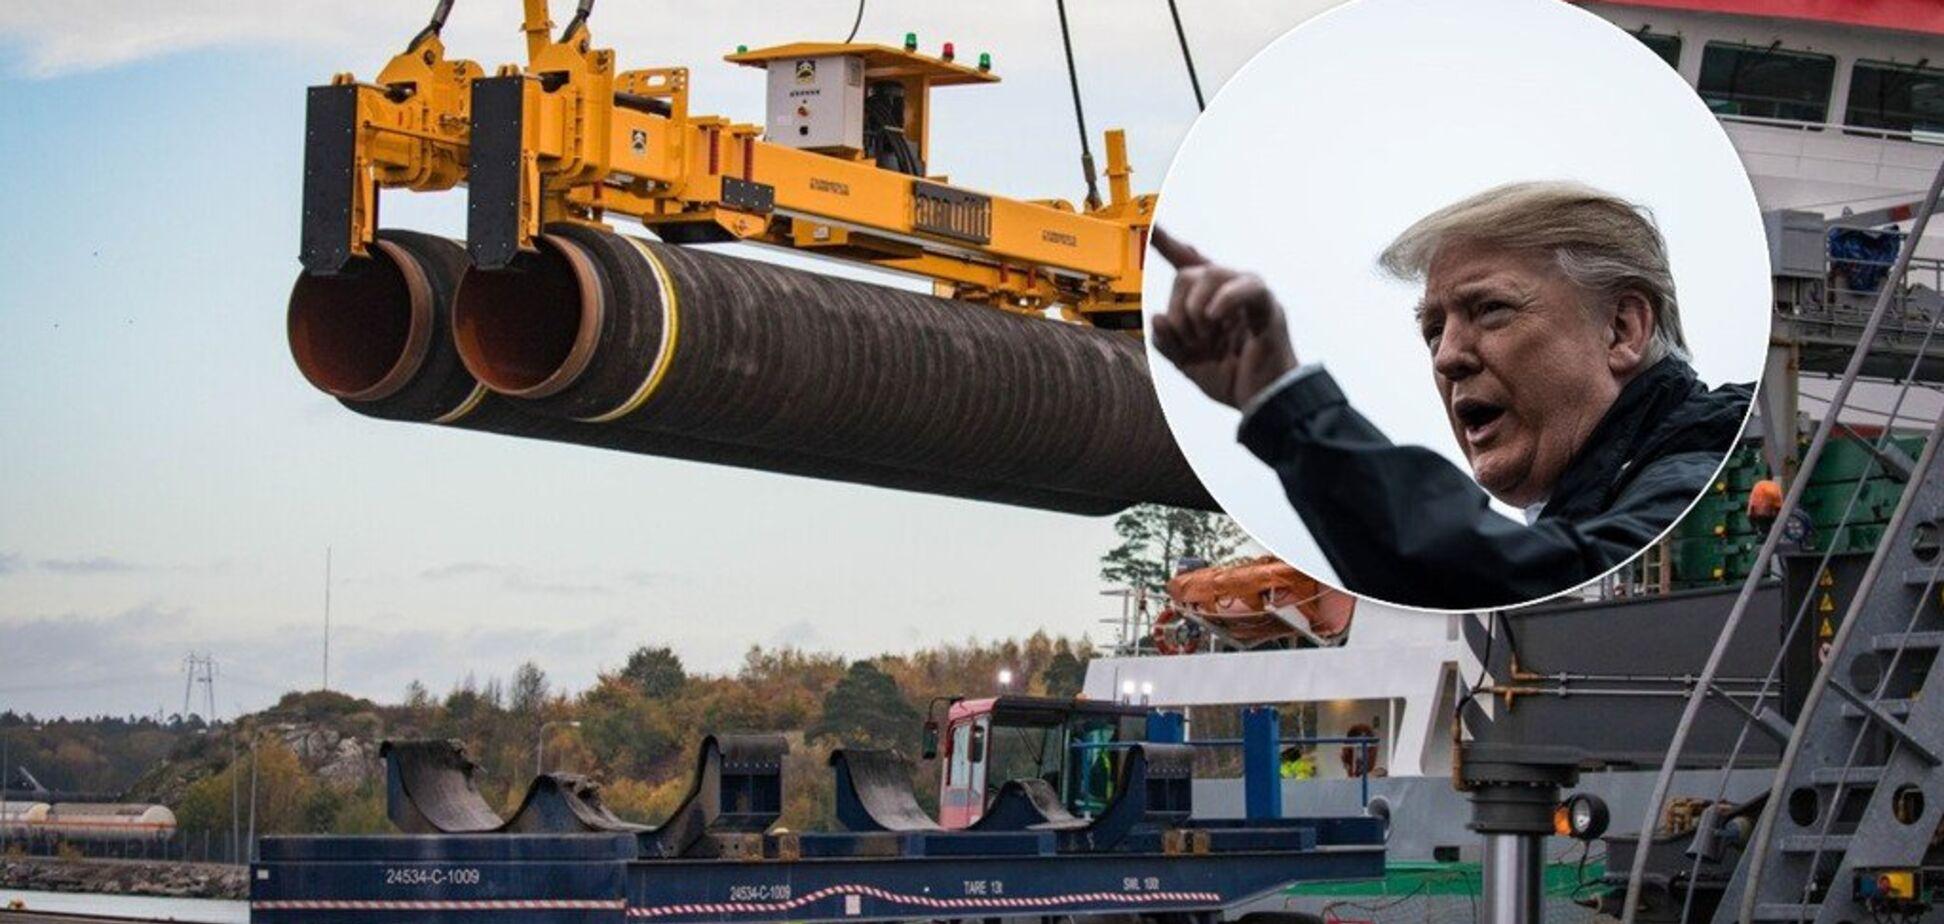 Сюрприз перед встречей? Трамп решил 'убить' газопровод Путина